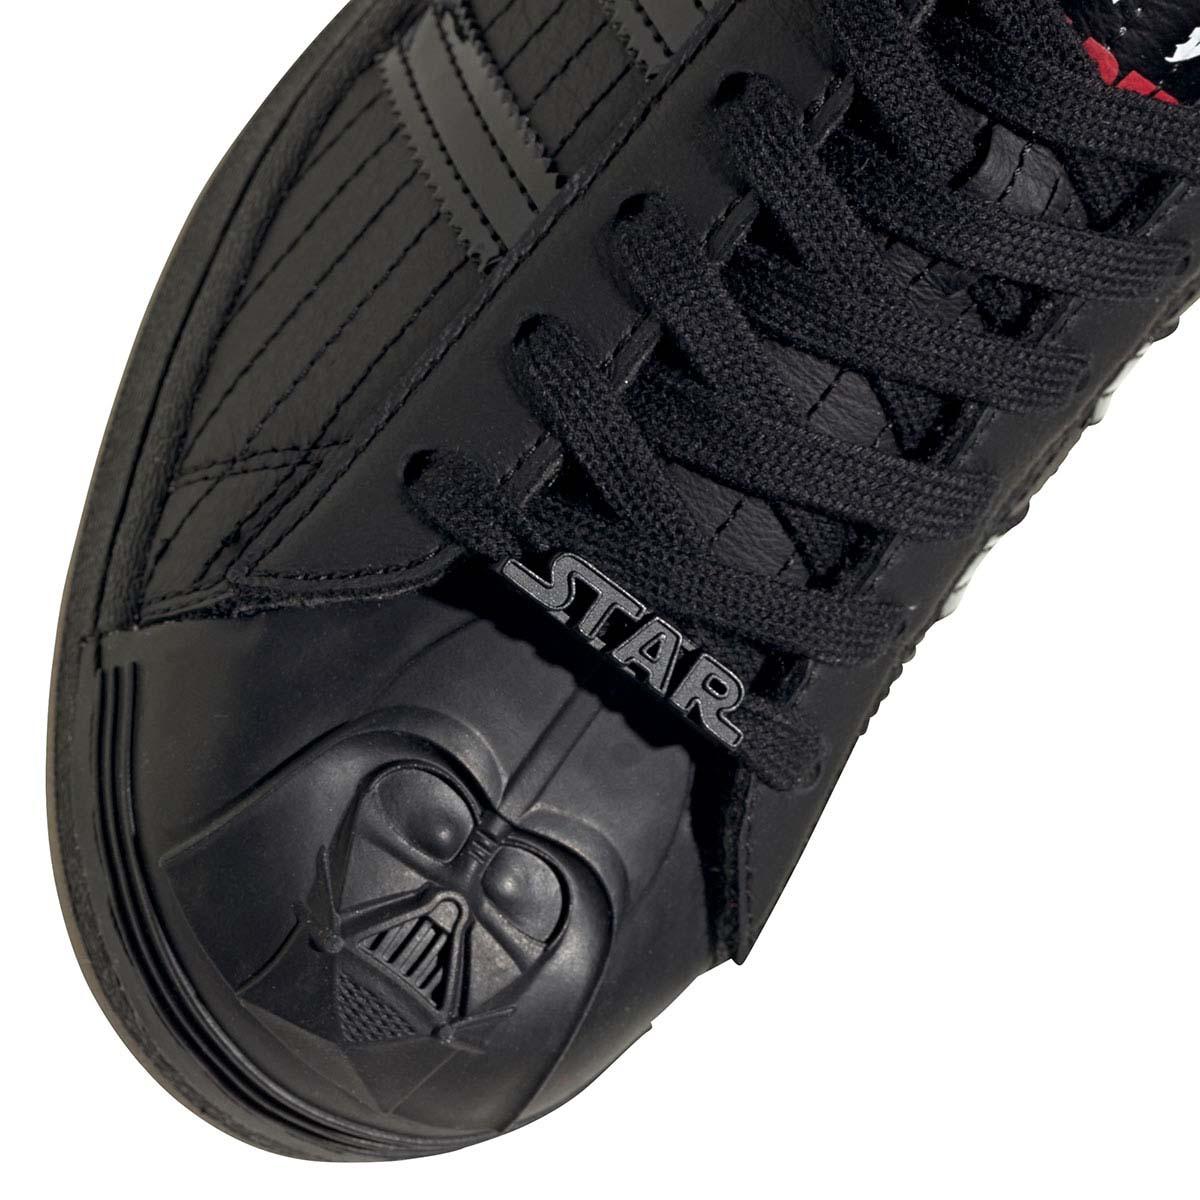 STARWARS x adidas SUPERSTAR DARTH VADER CORE BLACK / CORE BLACK / SCARLET FX9302 スターウォーズ × アディダス スーパースター ダース・ベイダー ブラック/レッド